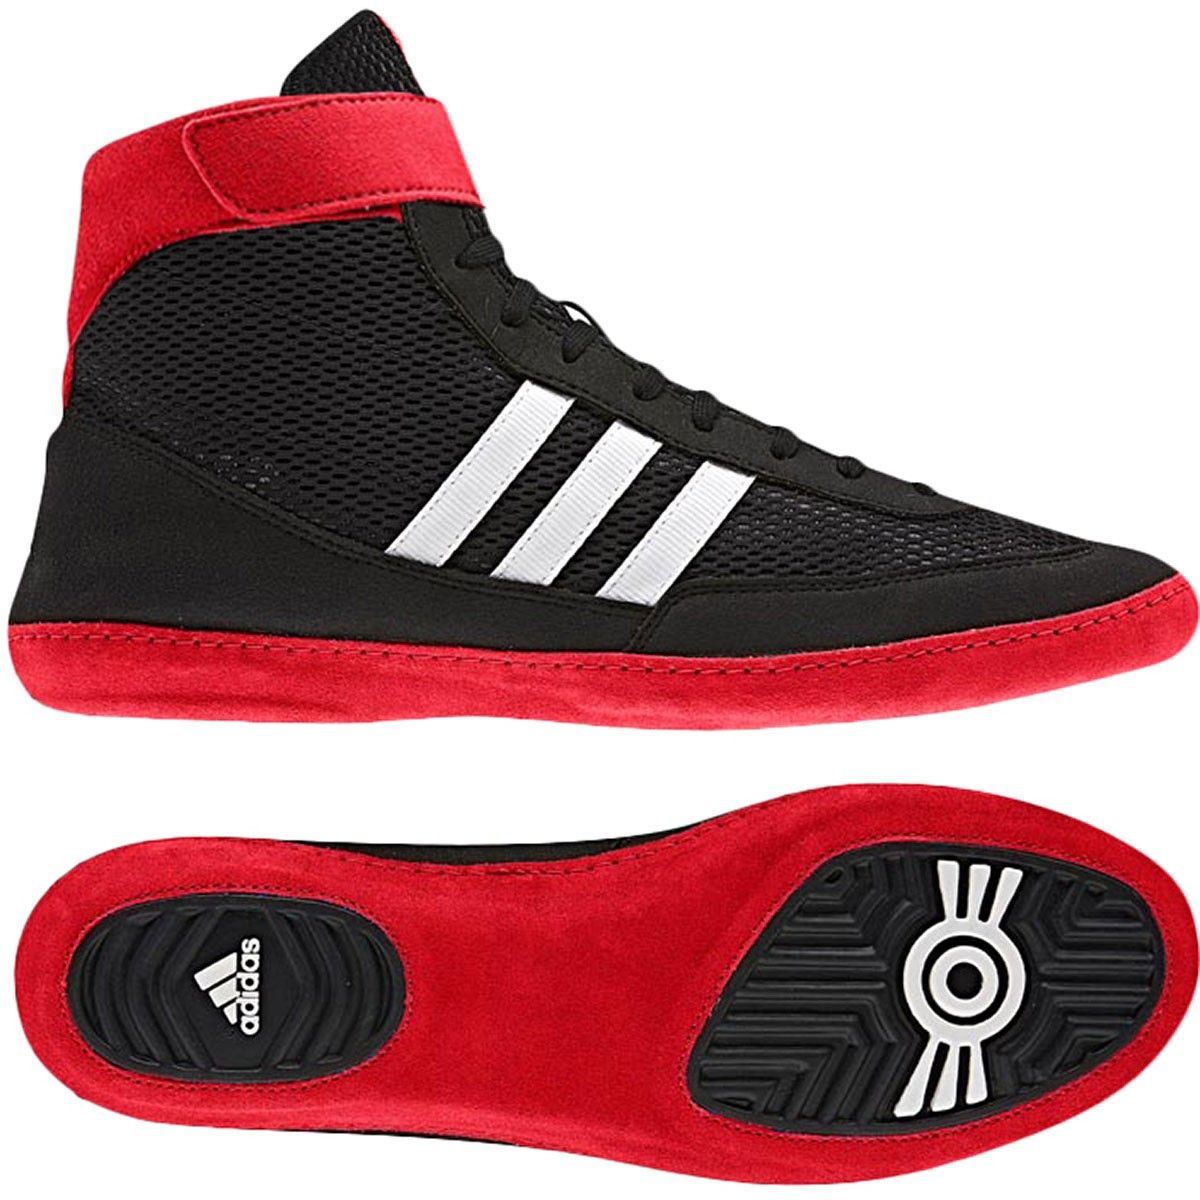 june 2013 adidas combat speed 4 wrestling shoes black